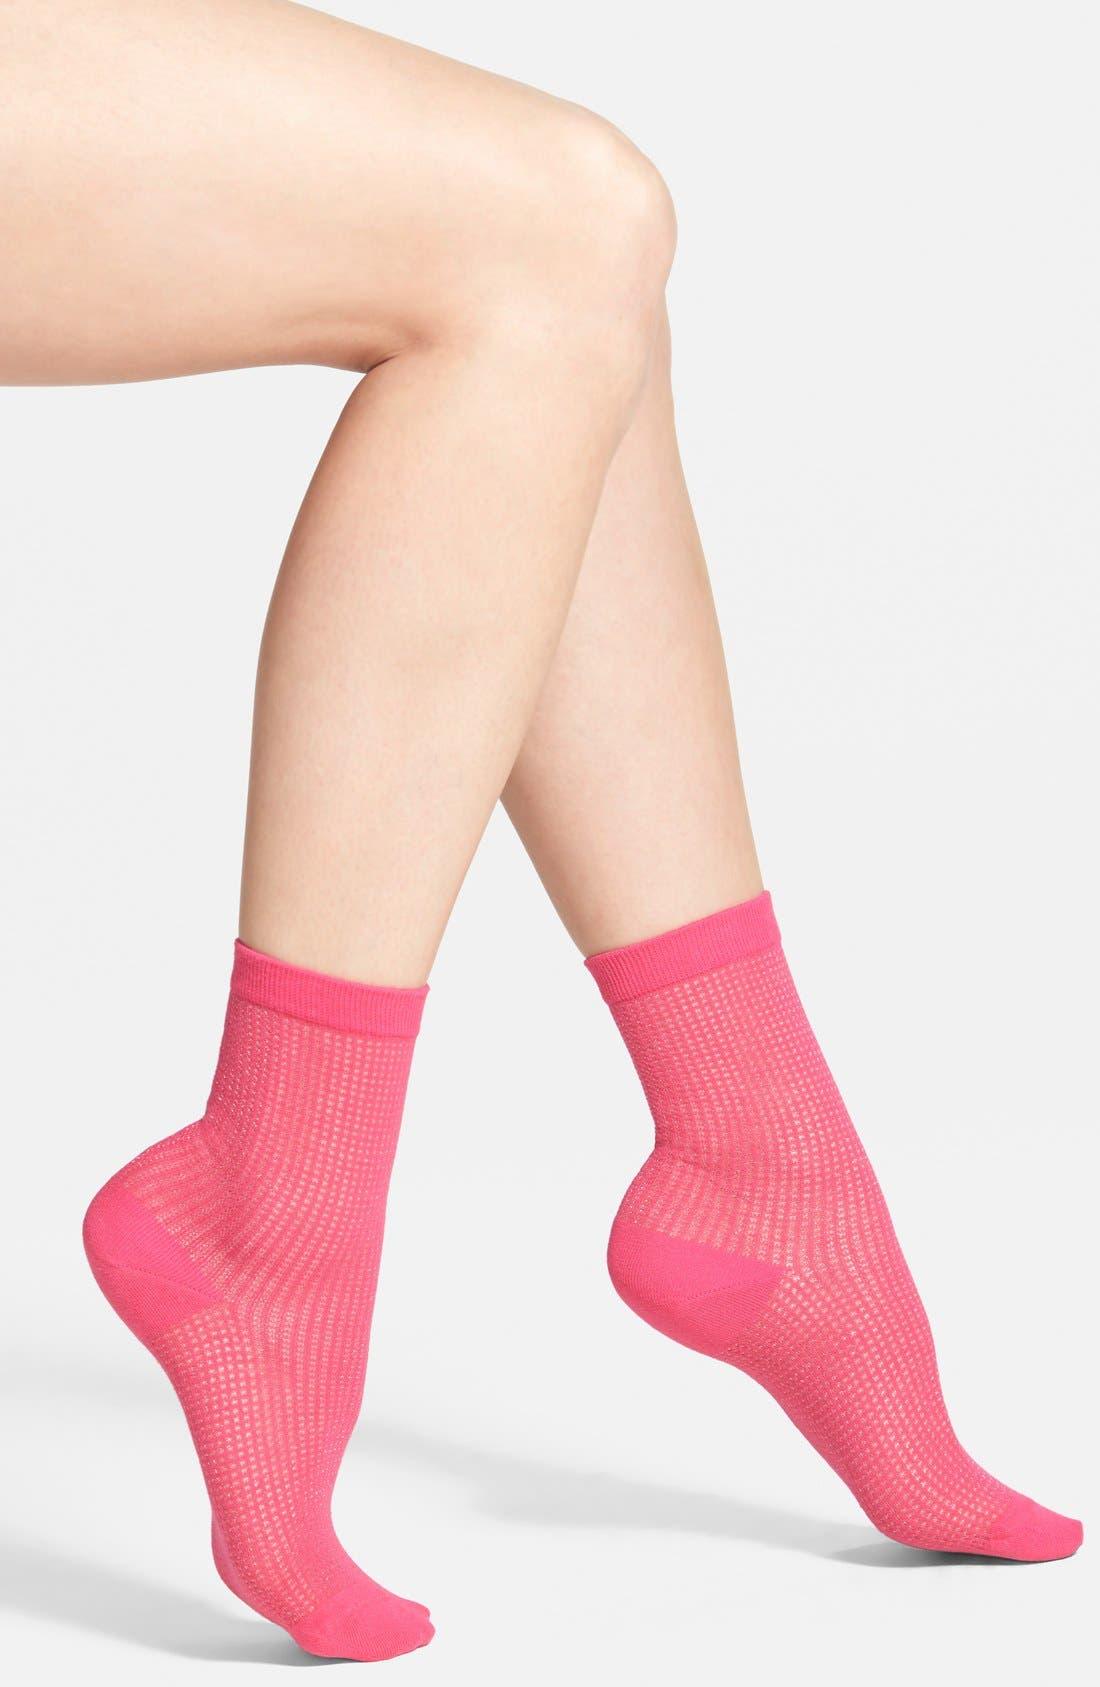 Main Image - kate spade new york 'filament caning' trouser socks